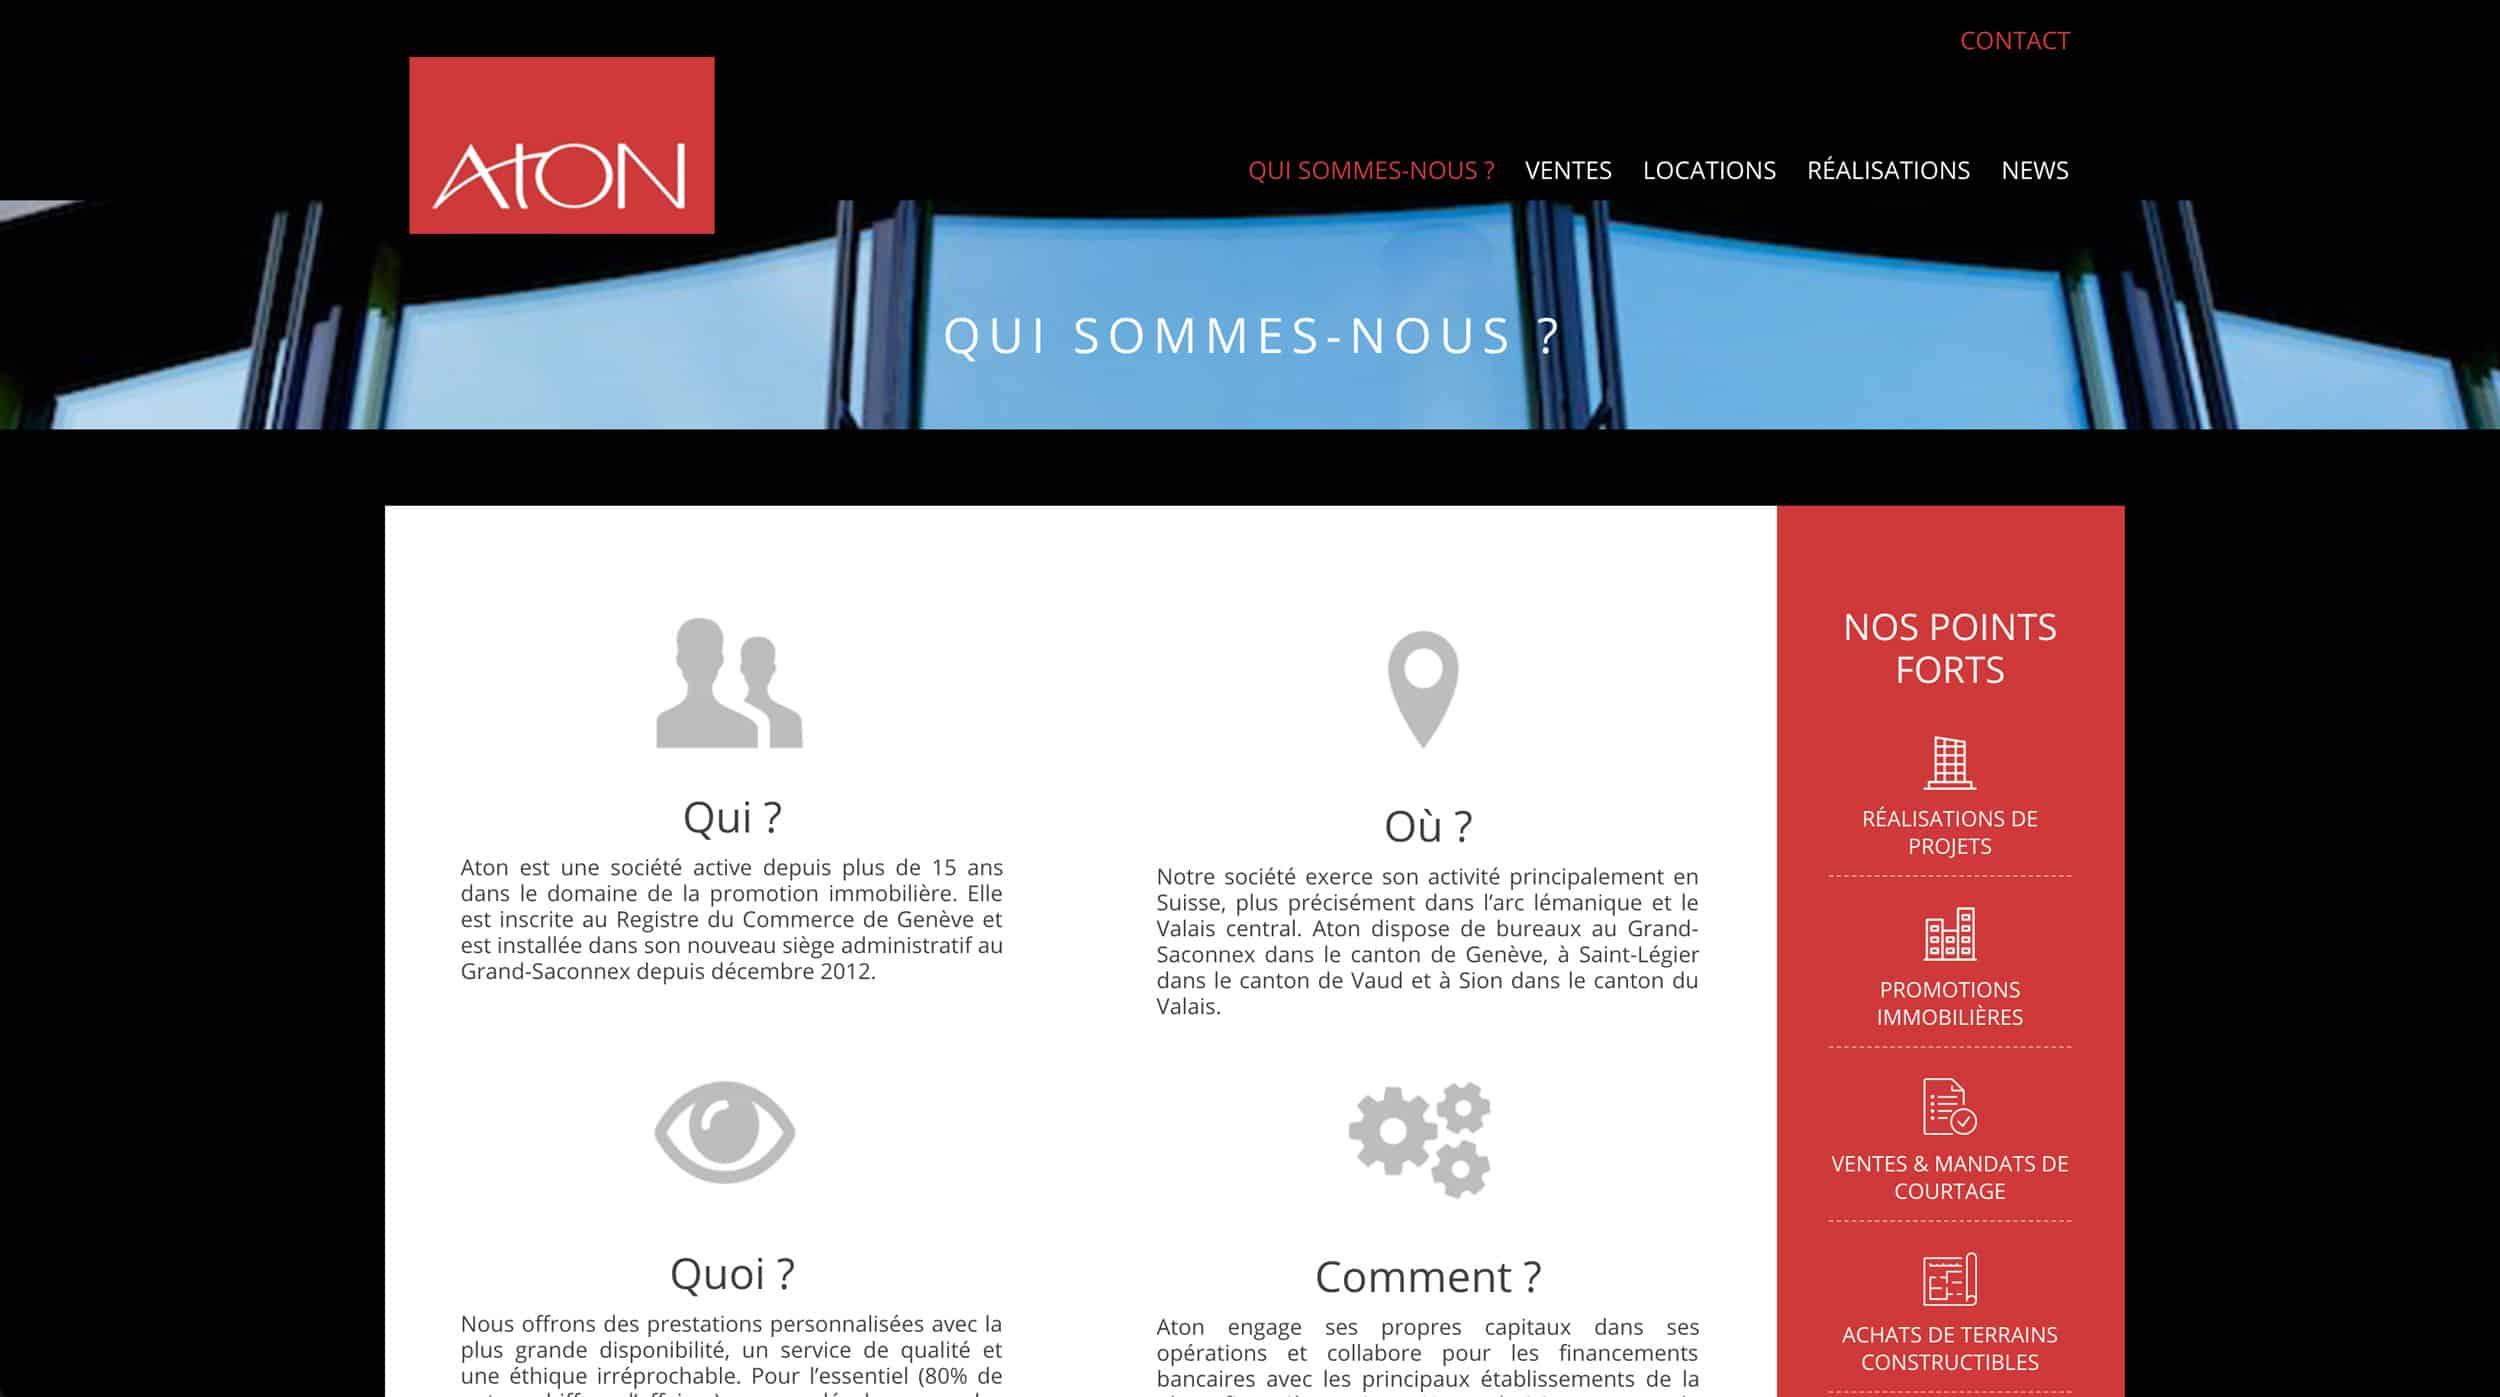 page qui_somme_nous Aton